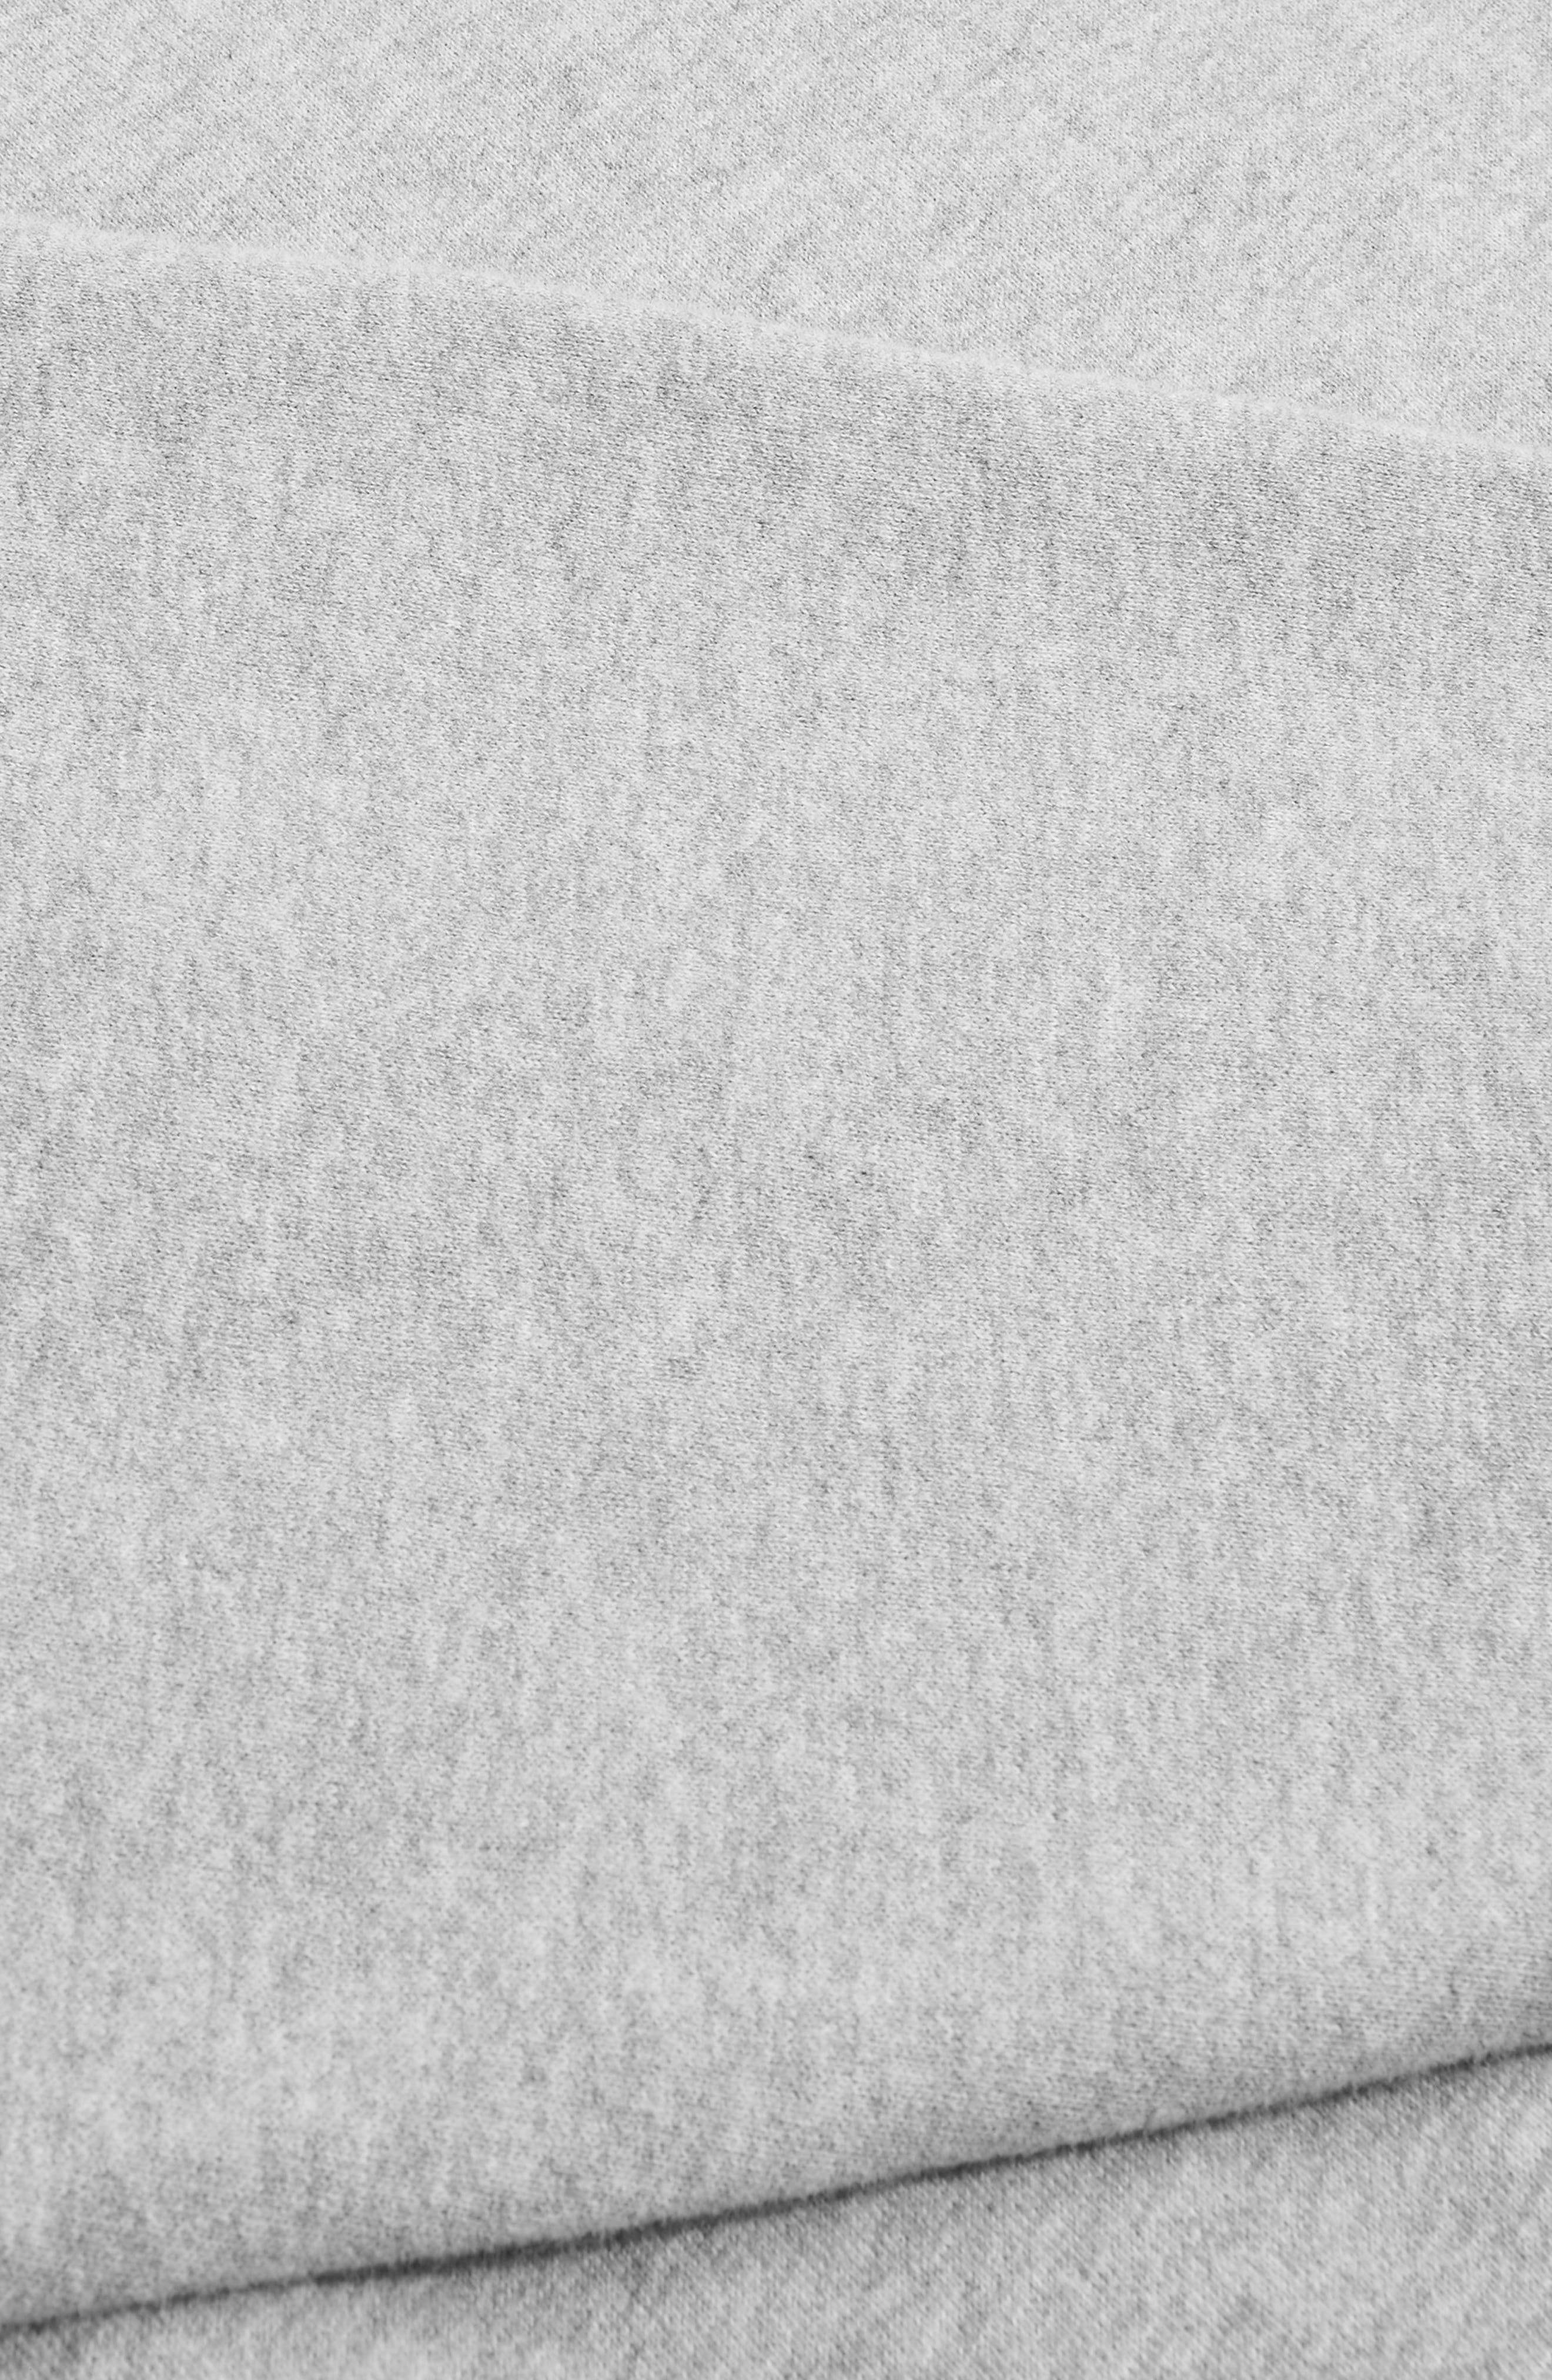 Oversize Sweatshirt,                             Alternate thumbnail 2, color,                             020